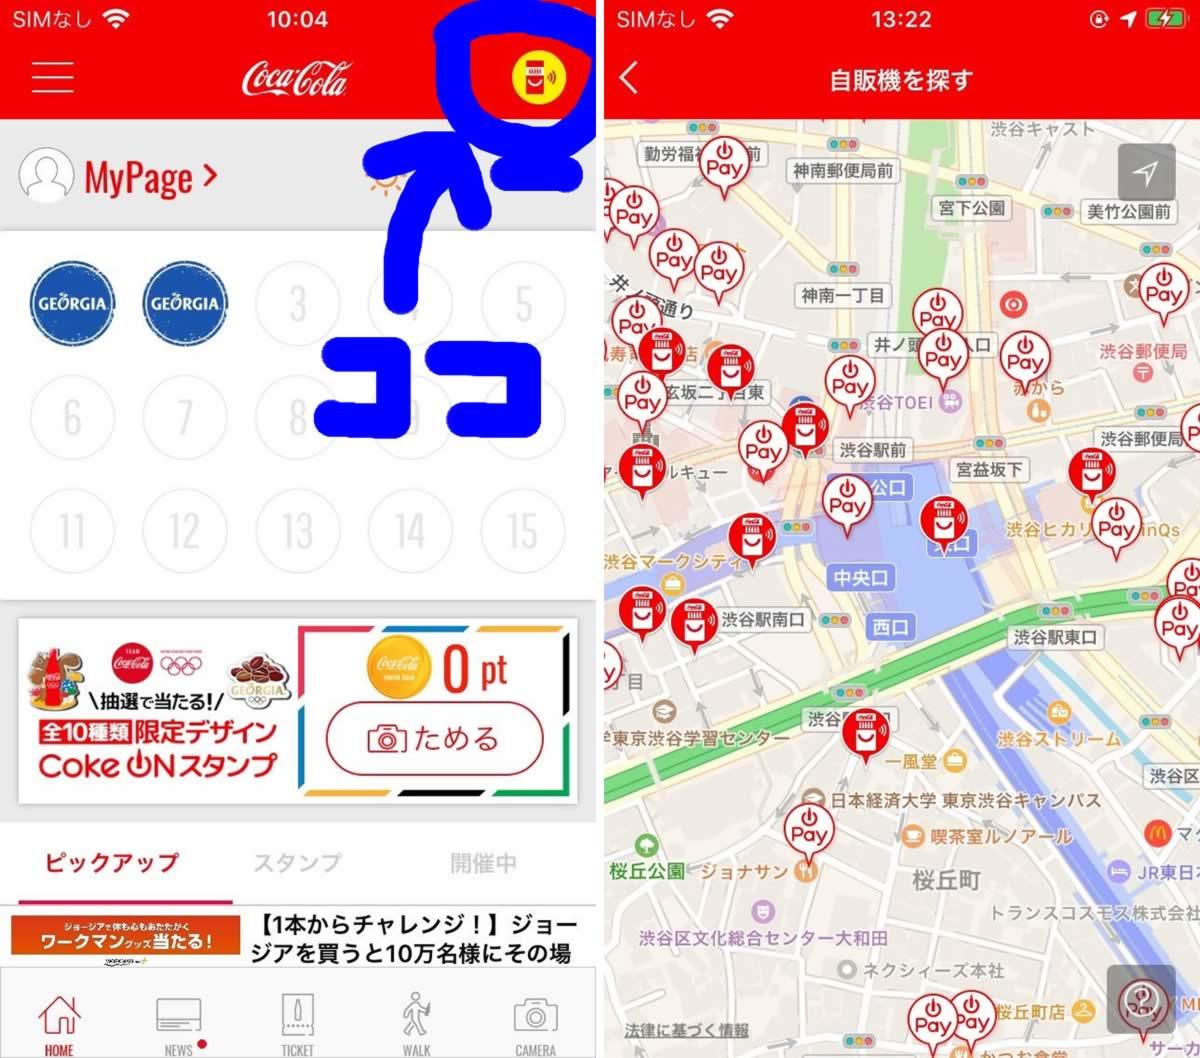 Coke On対応自販機はどこ?地図はある?